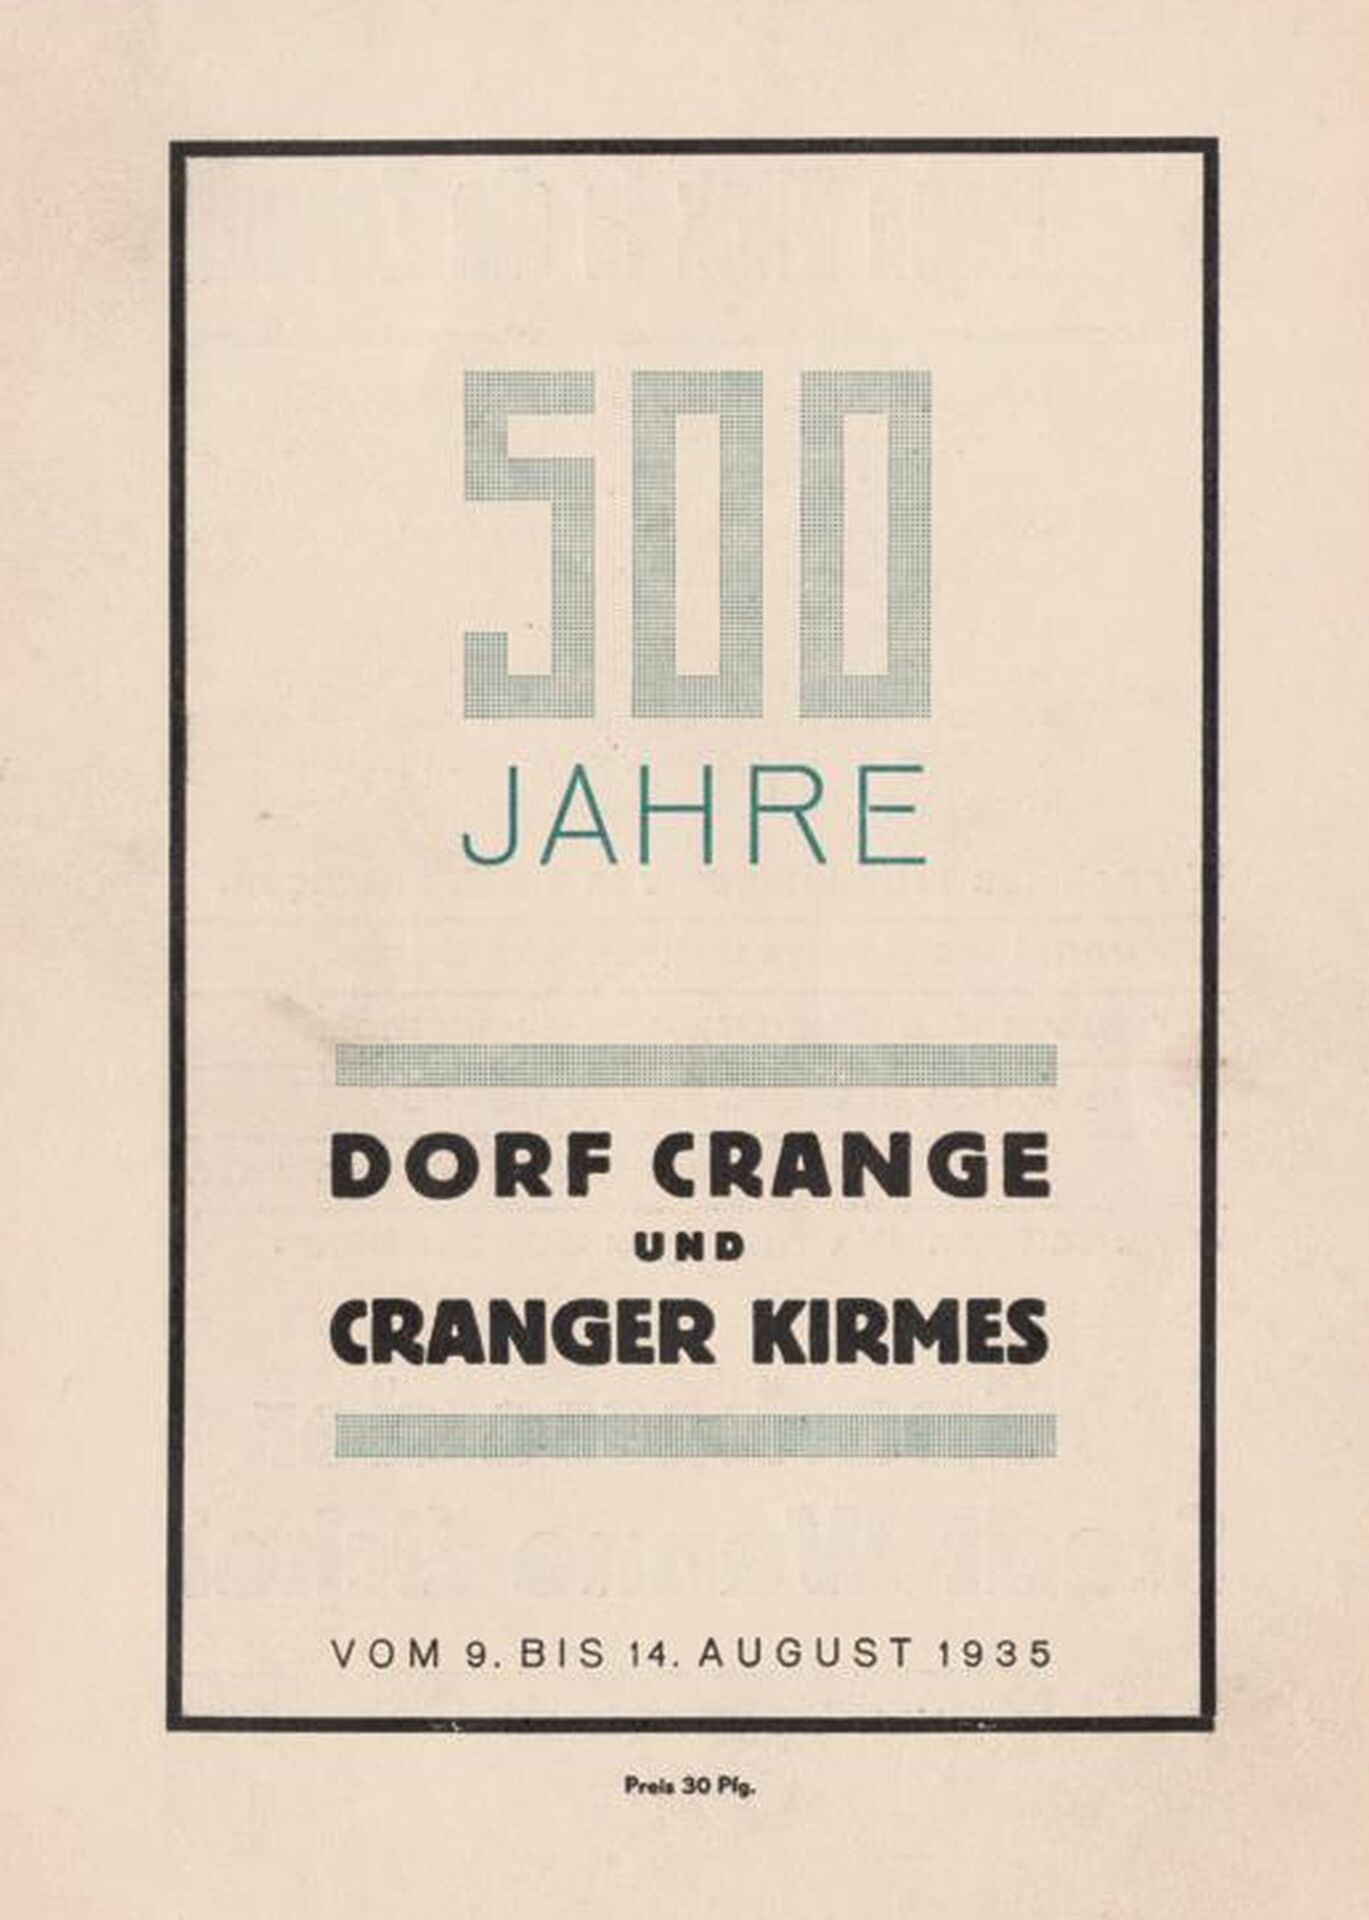 Festschrift '500 Jahre Dorf Crange und Cranger Kirmes', Titelblatt, 1935.jpg